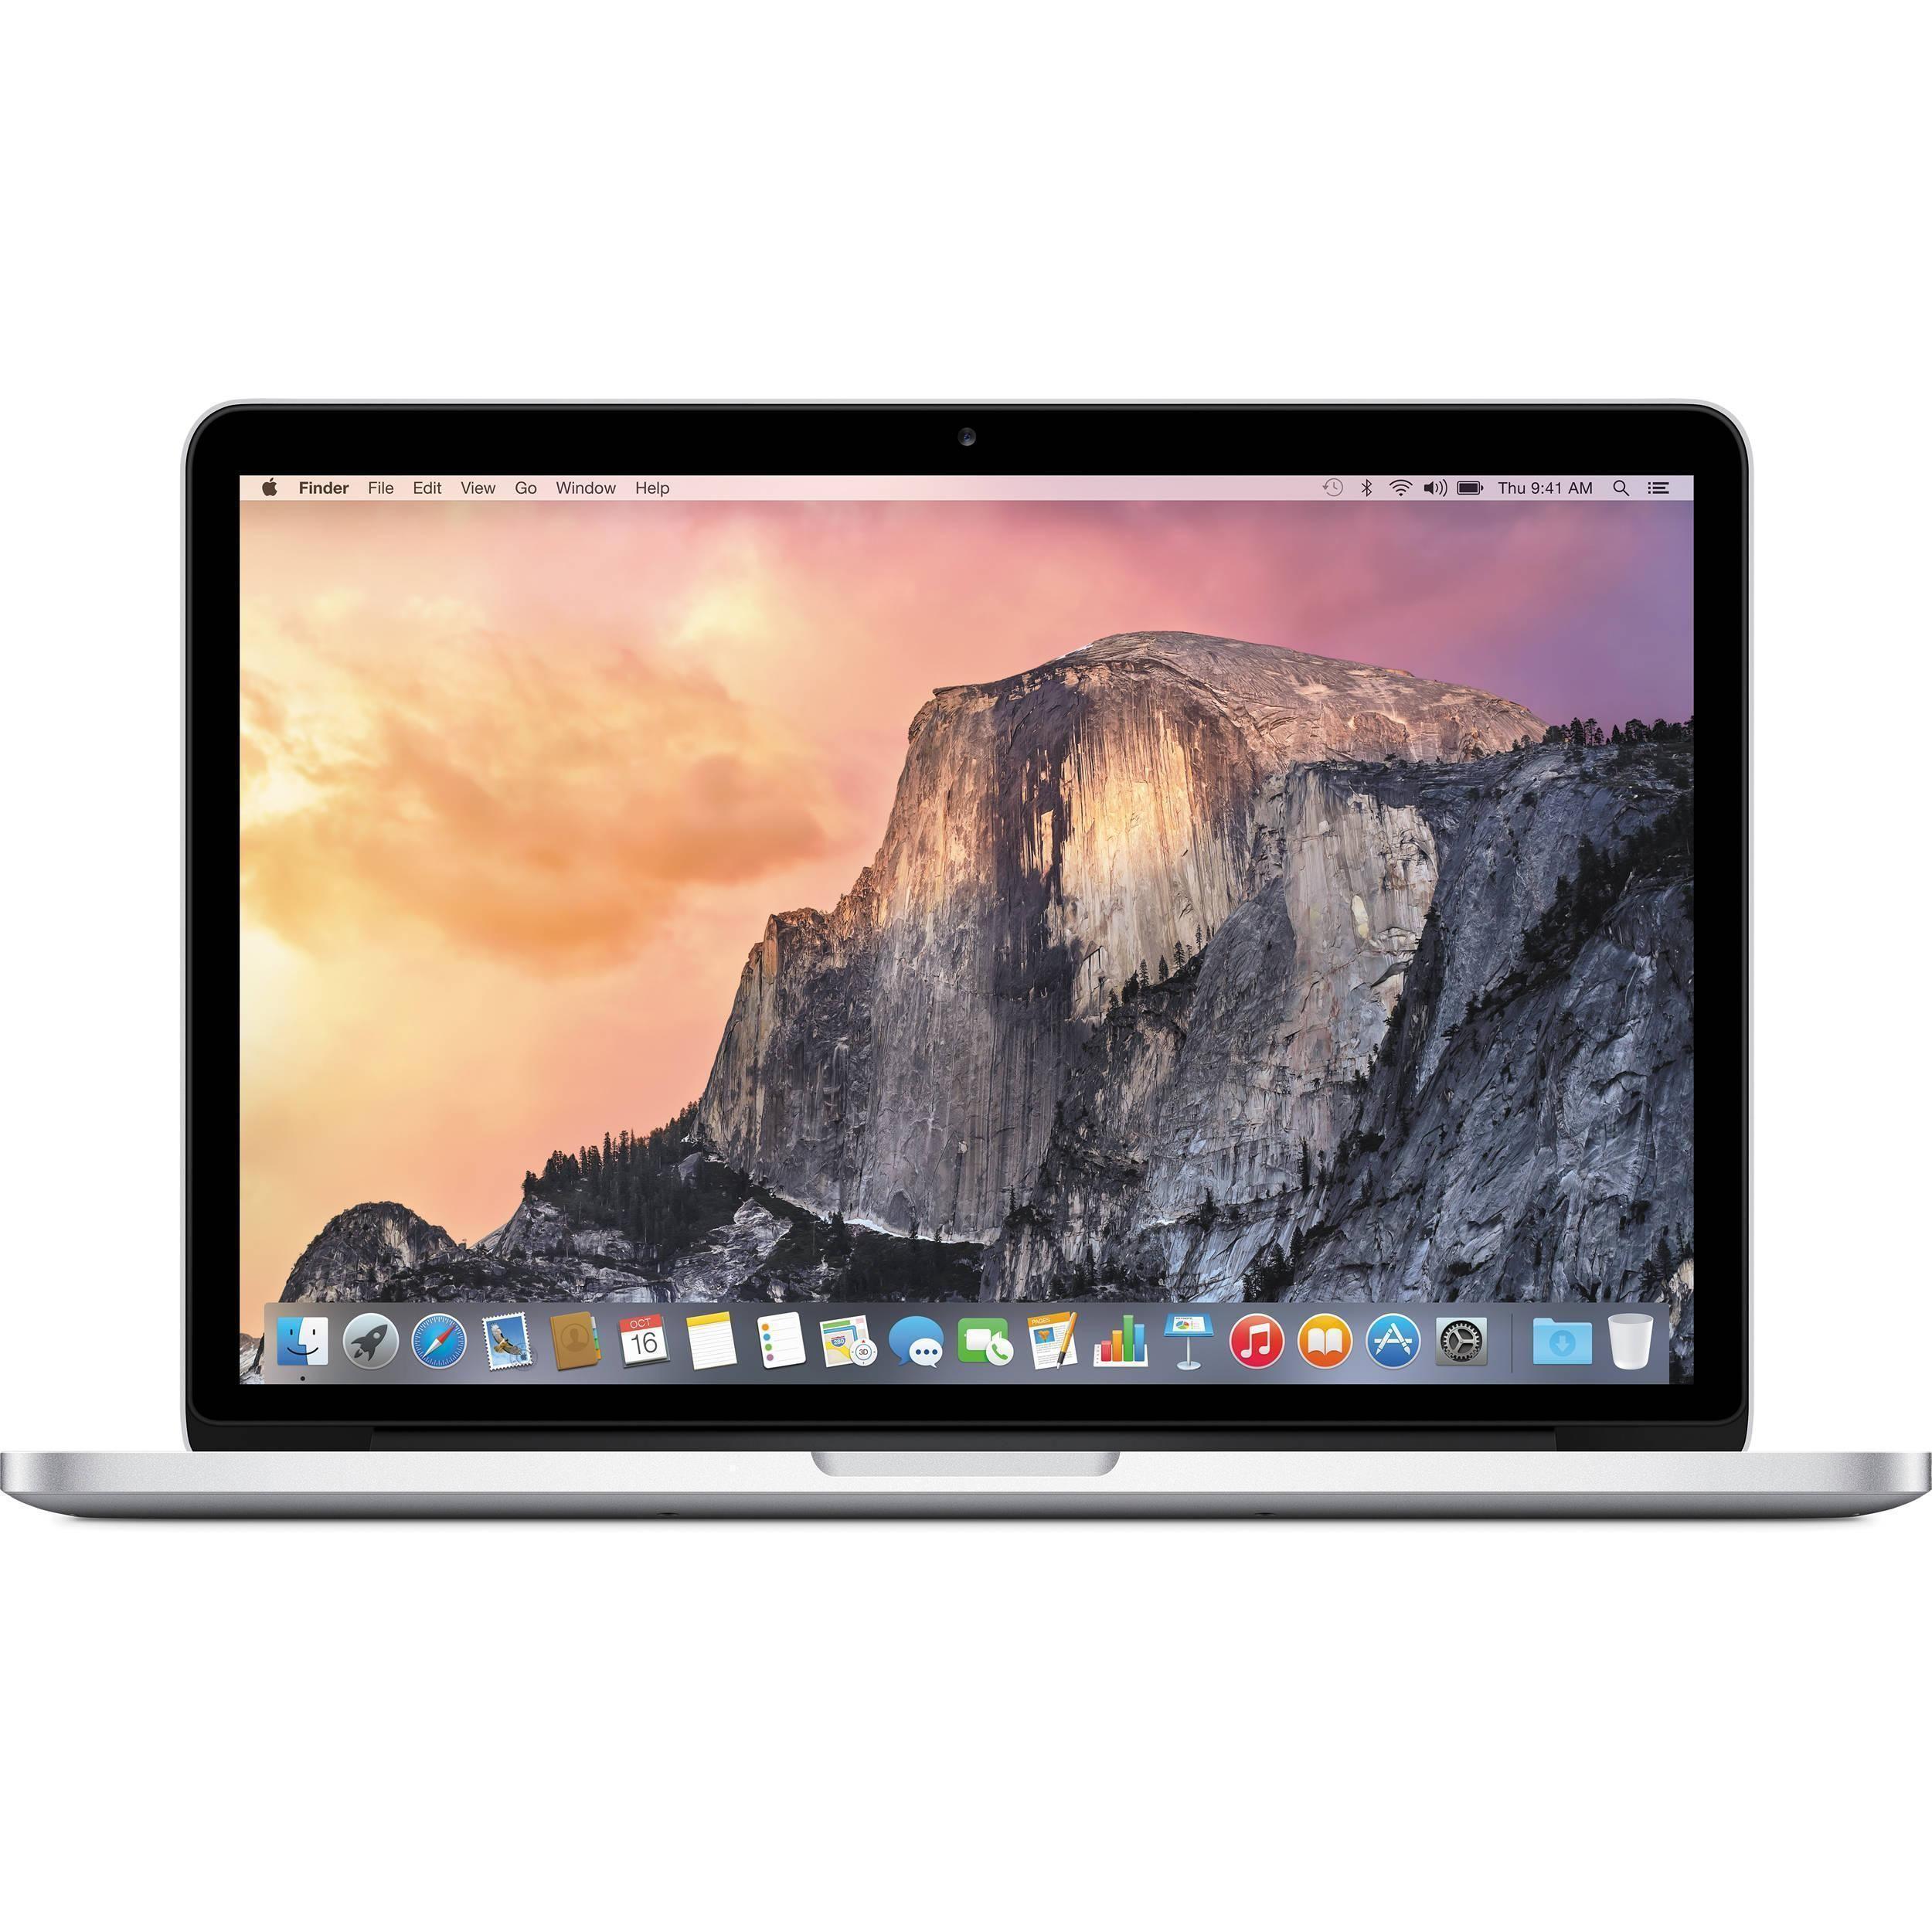 Macbook Pro 13 3 Retina Core I5 5257u 2 7ghz Ssd 256gb Ram 8gb Qwerty Refurbished In 2020 Apple Macbook Air Apple Laptop Macbook